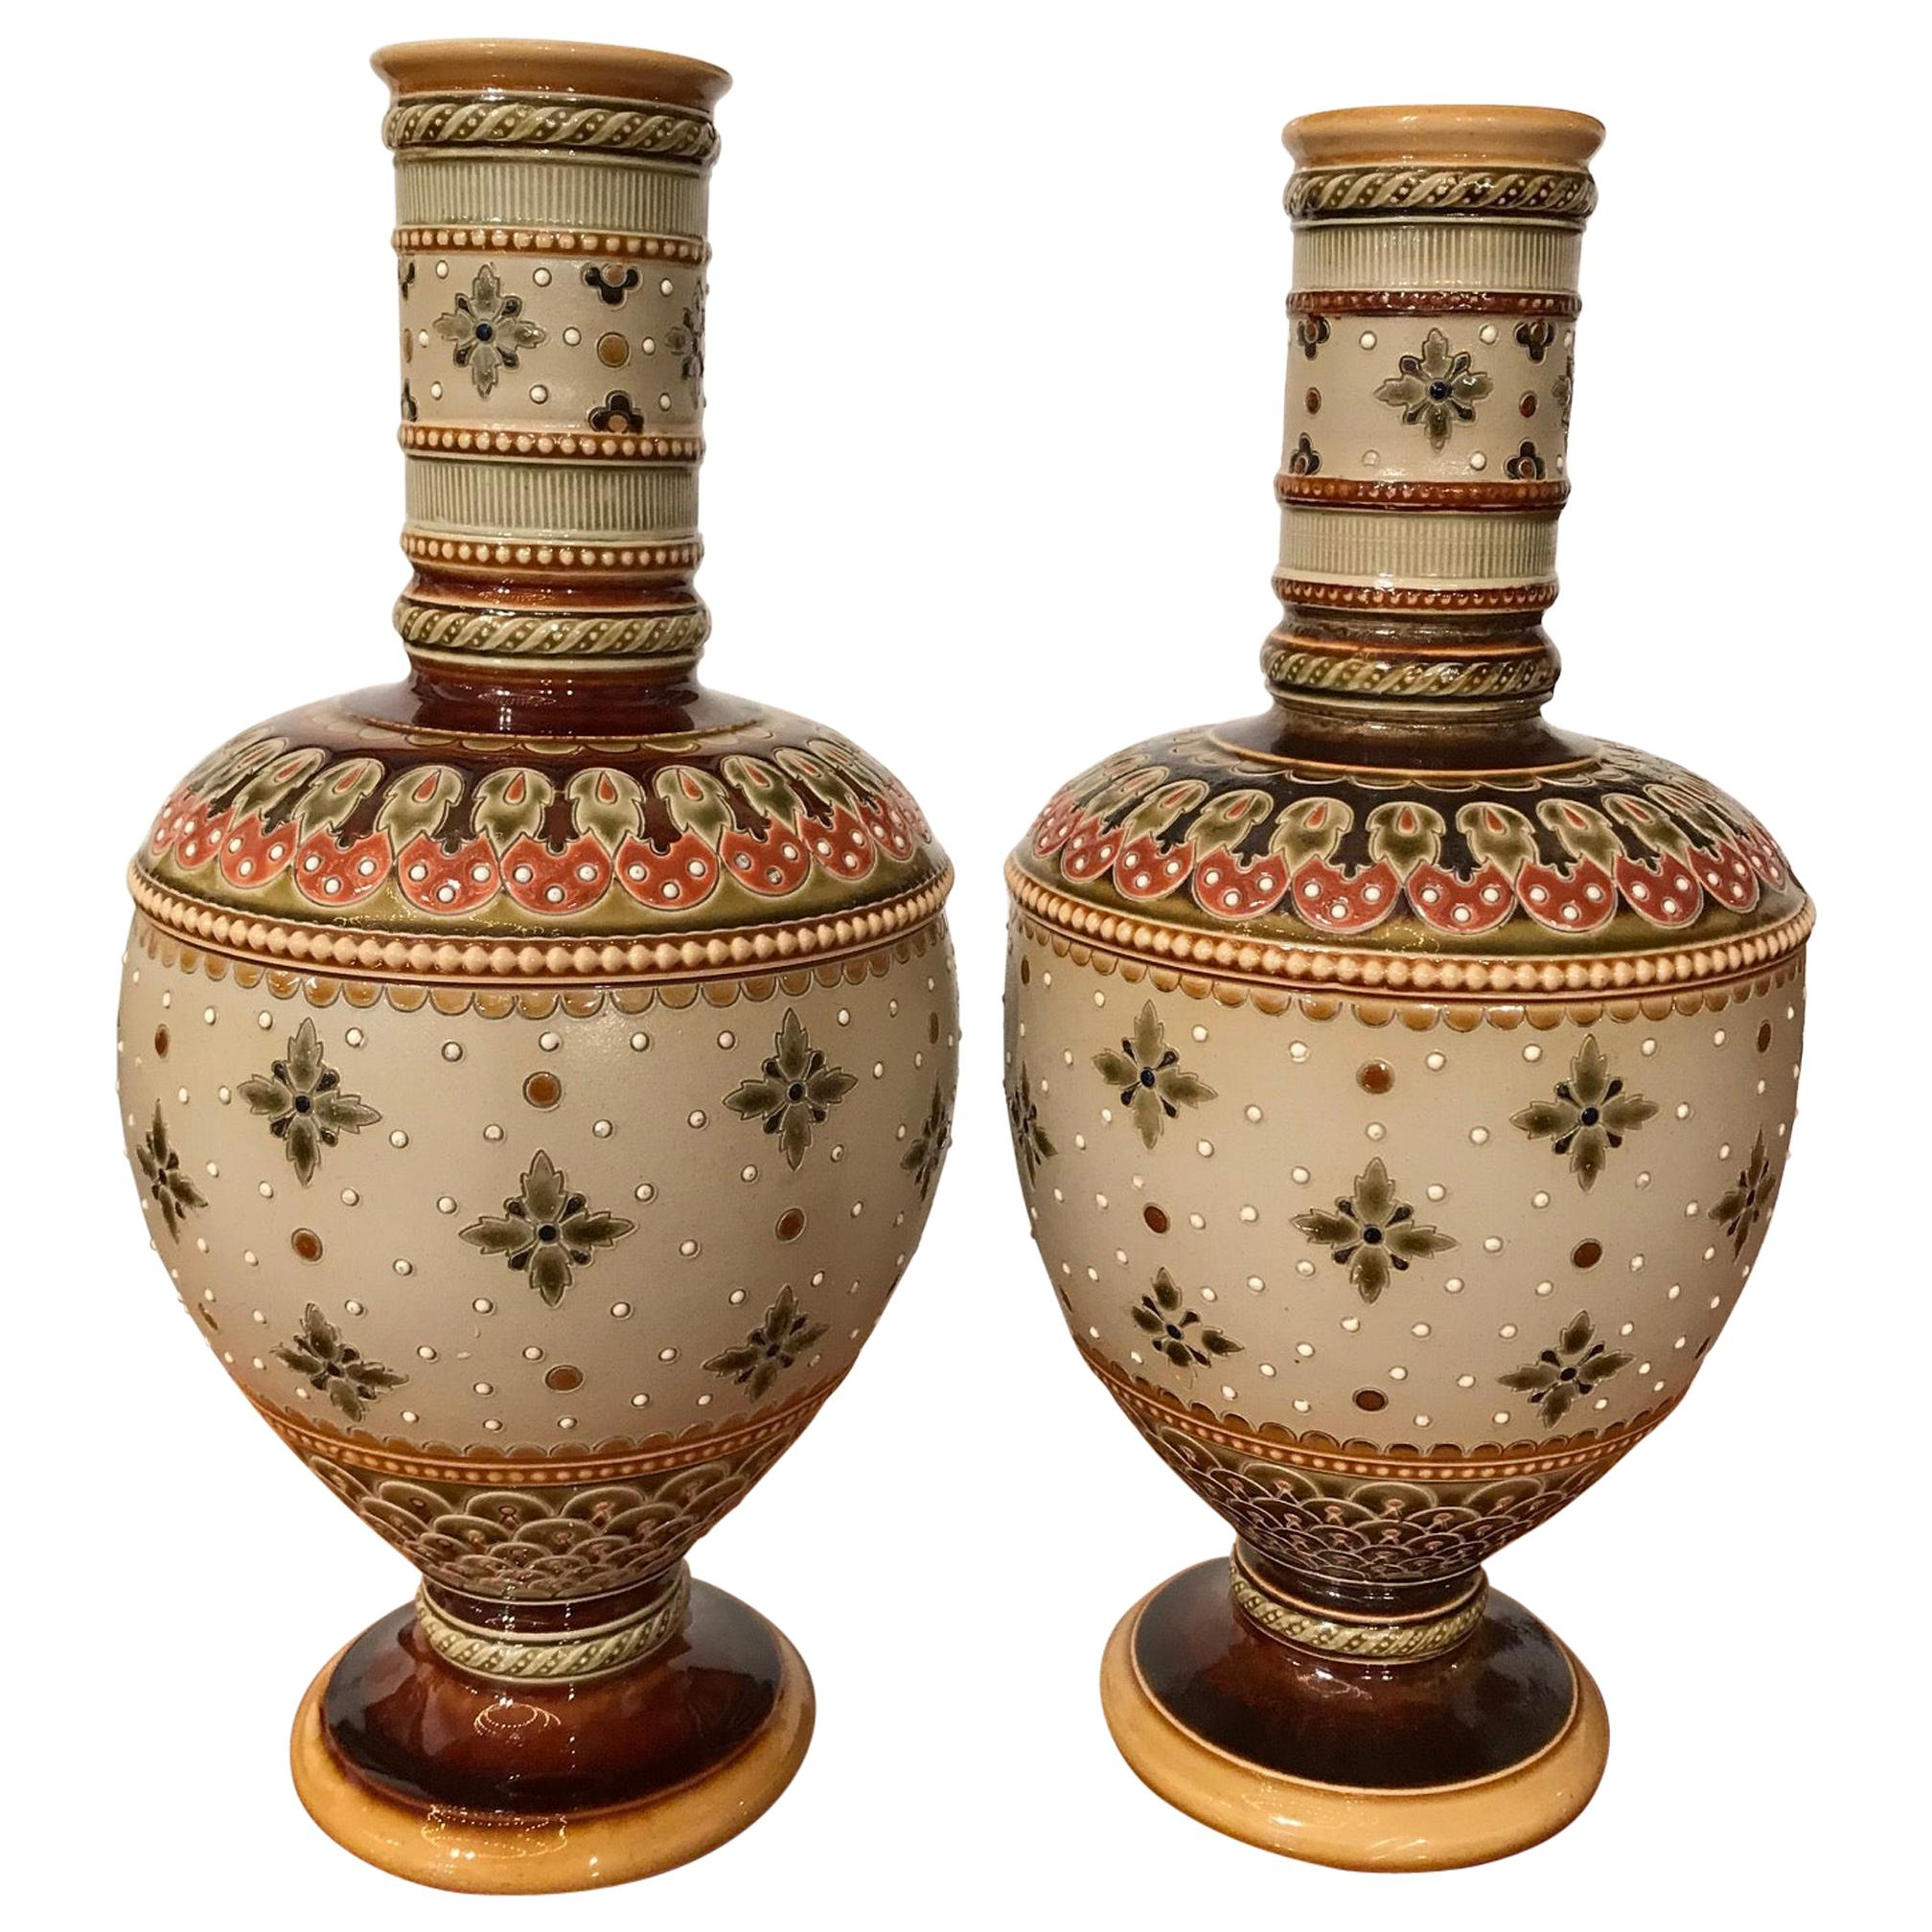 Pair of Mettlach Vases by Villeroy & Boch, circa 1900